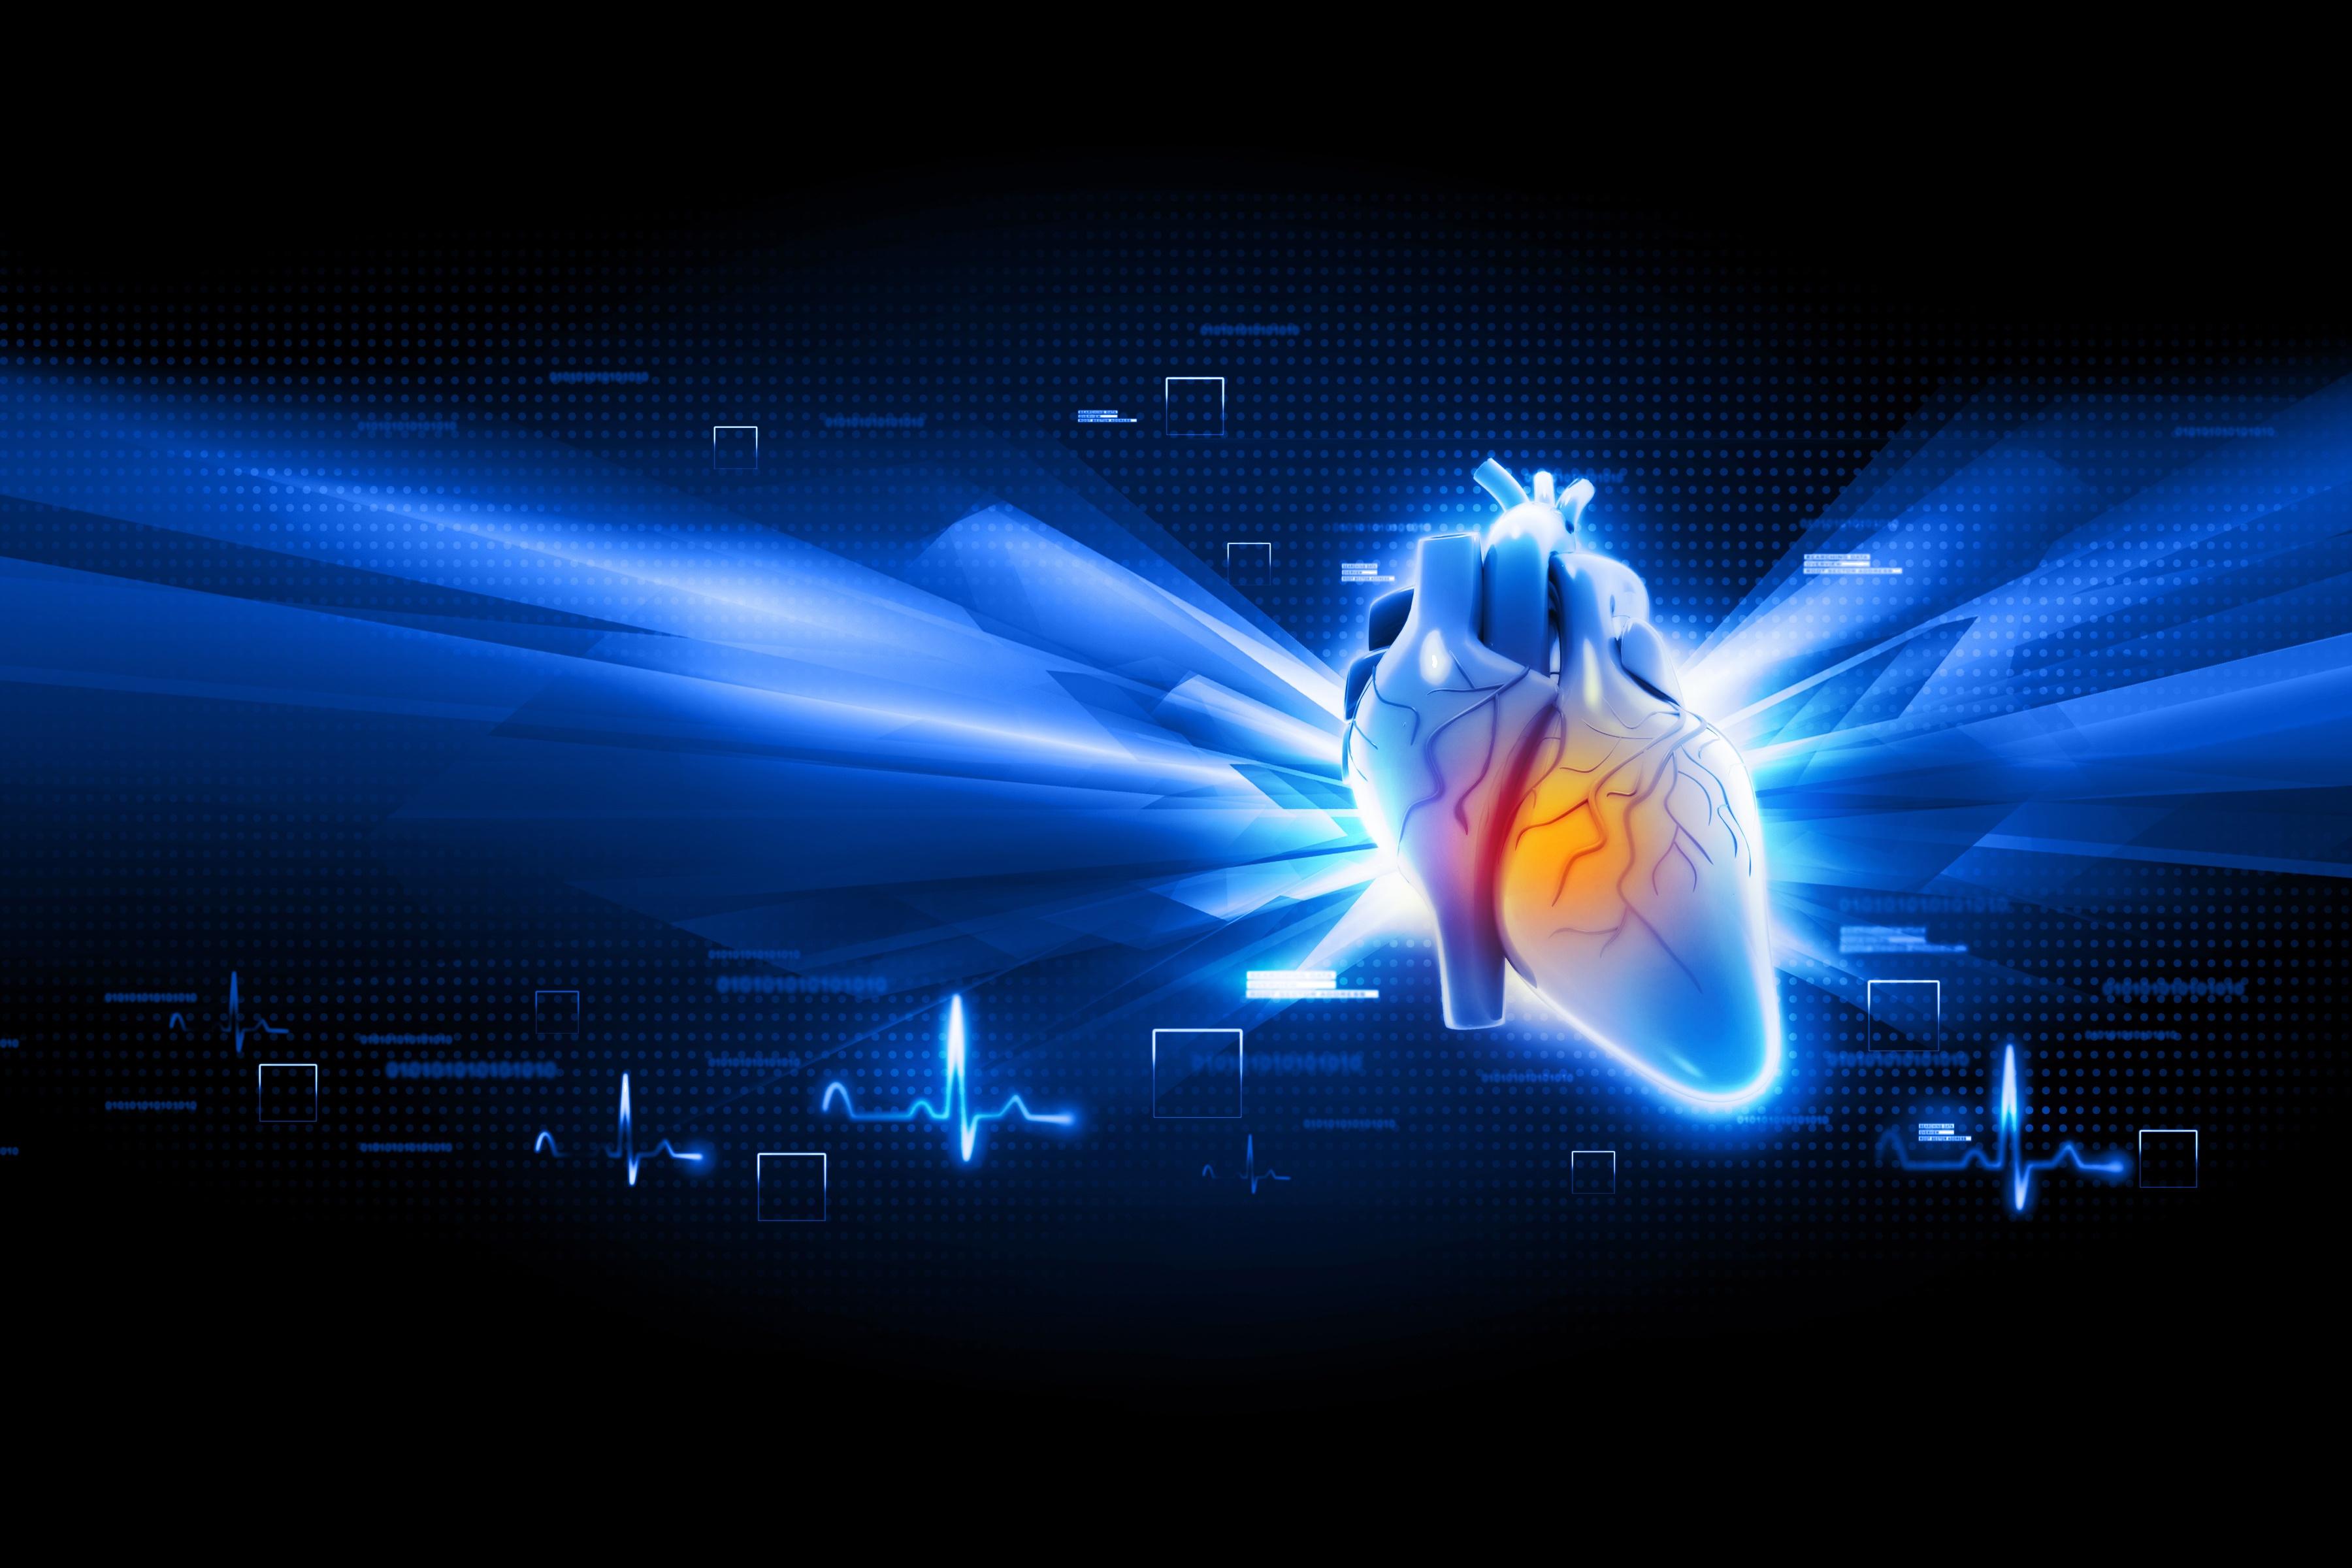 cardiovascular-disease-is-killing-hemodialysis-patients